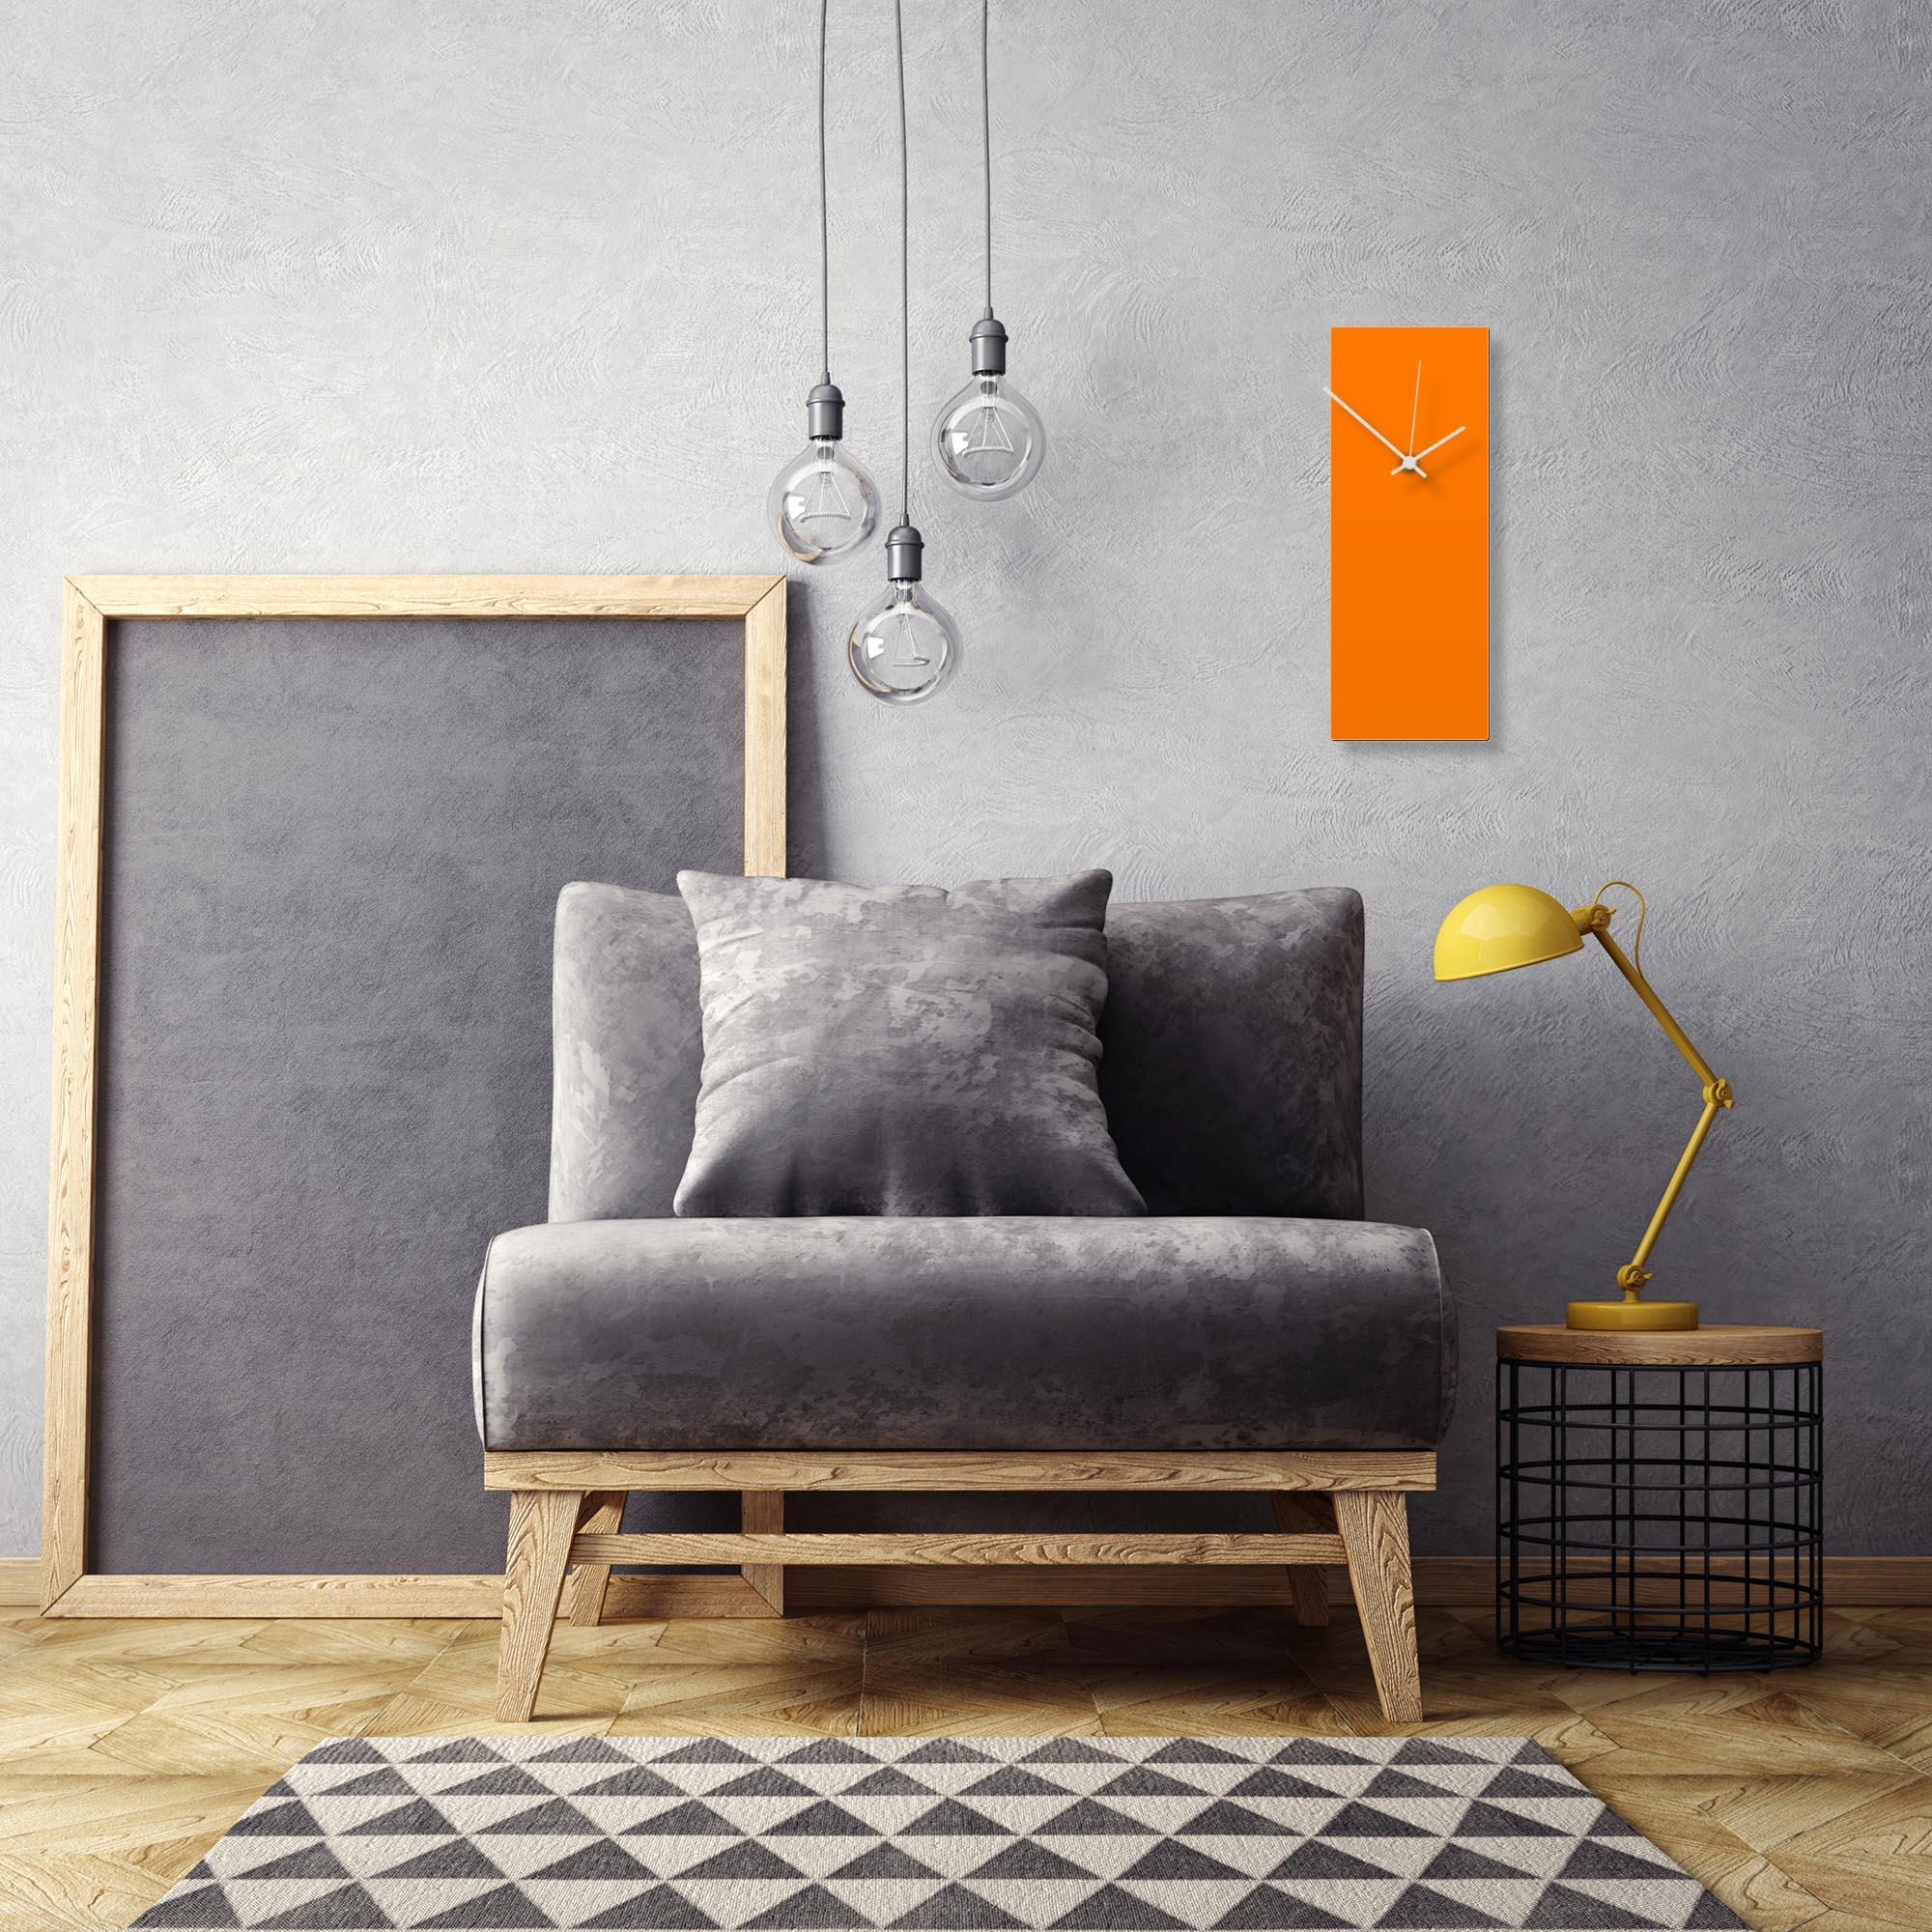 Orangeout White Clock by Adam Schwoeppe Contemporary Clock on Aluminum Polymetal - Alternate View 1